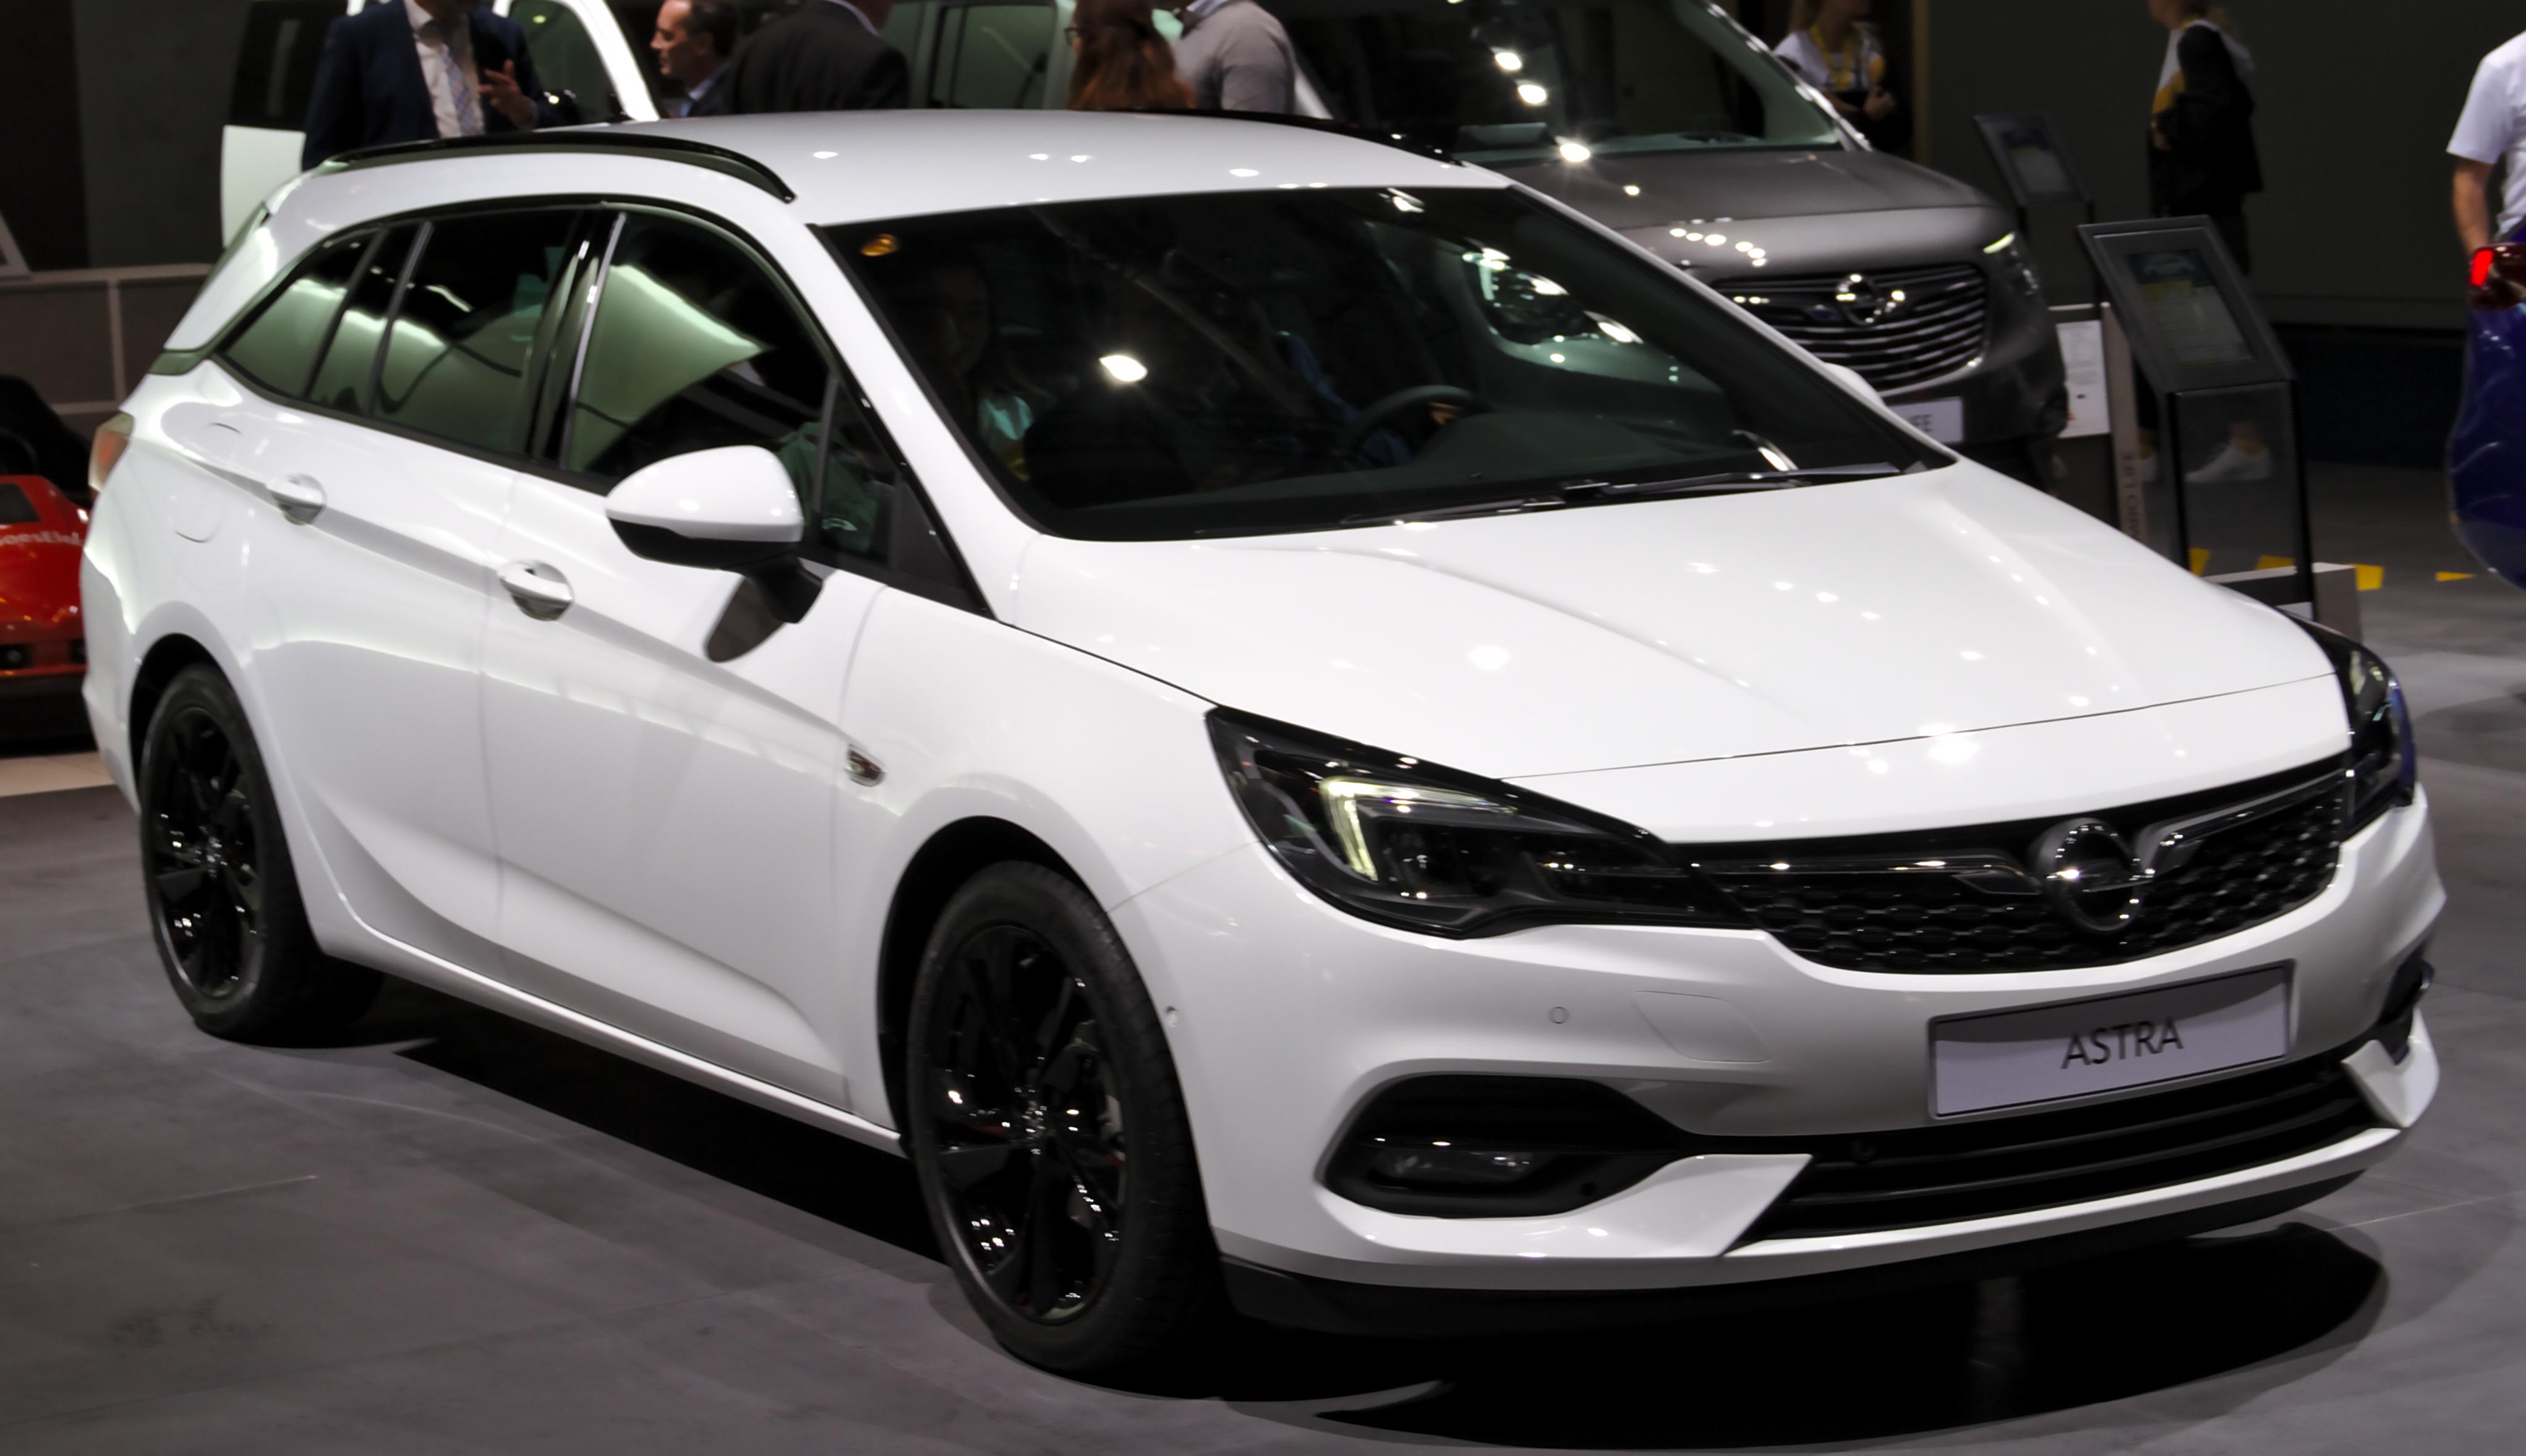 File Opel Astra K Sports Tourer At Iaa 2019 Img 0611 Jpg Wikimedia Commons